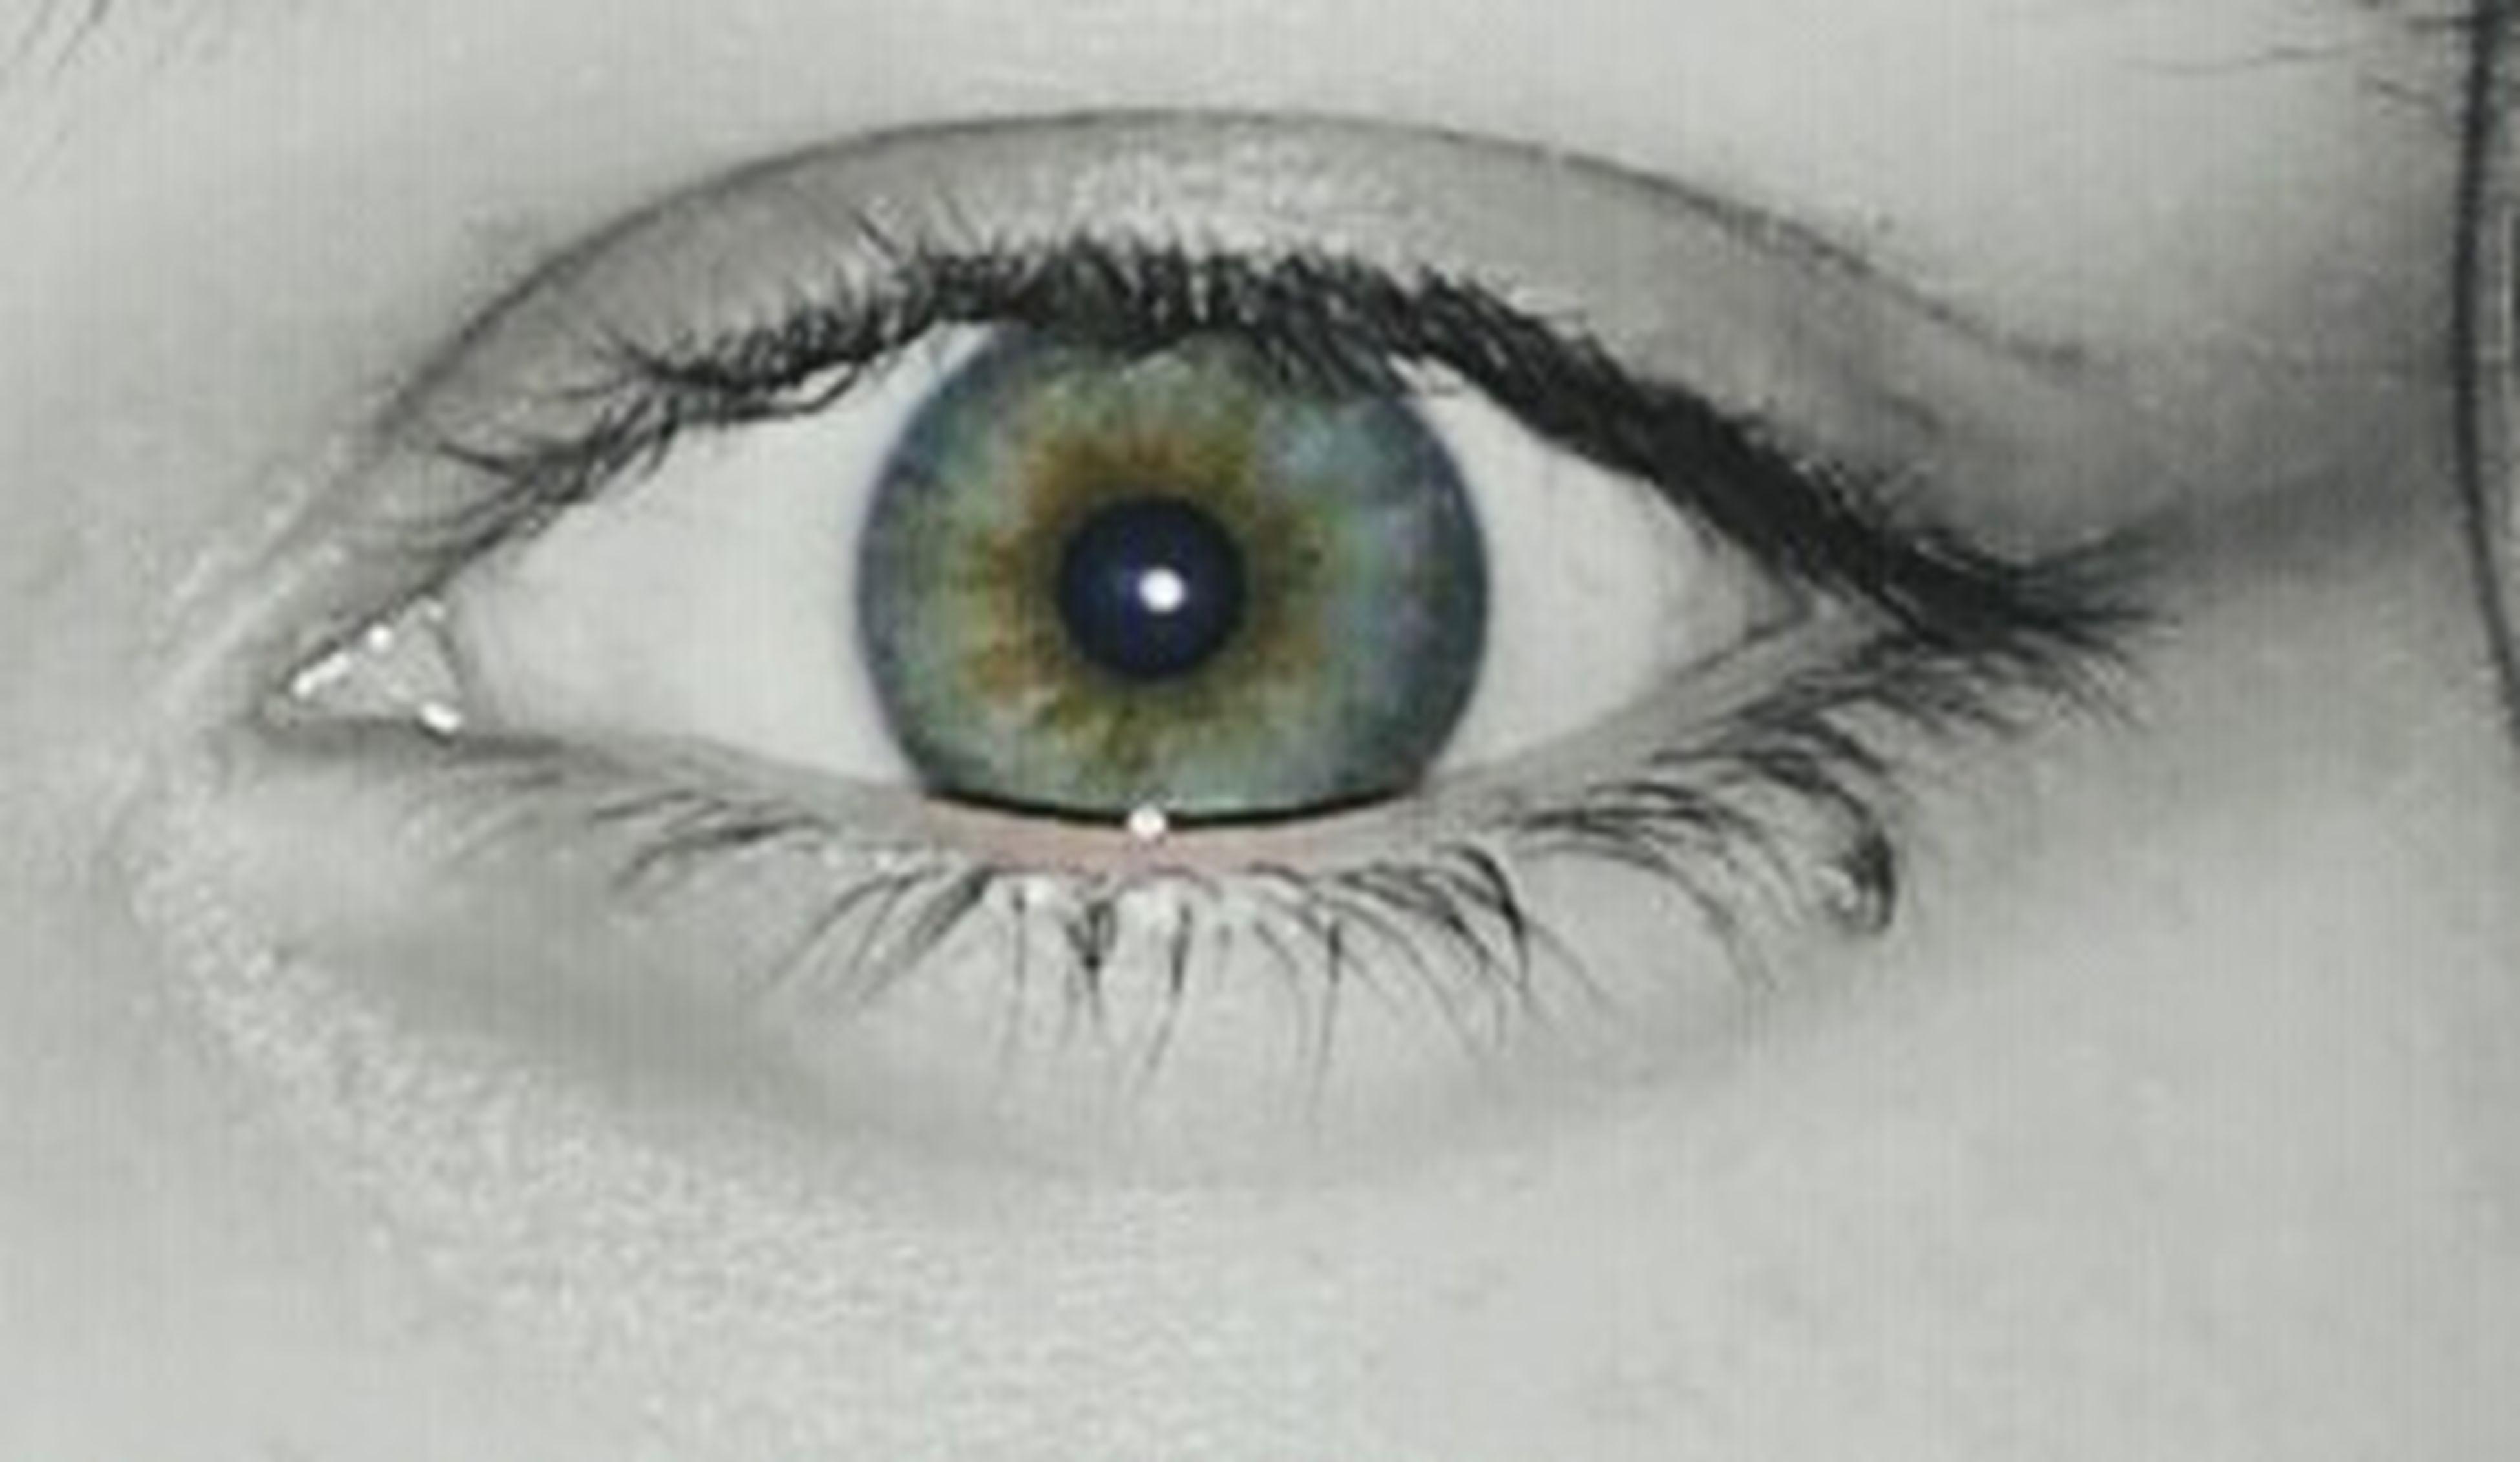 human eye, eyelash, looking at camera, eyesight, sensory perception, extreme close-up, full frame, close-up, backgrounds, staring, portrait, selective focus, eyeball, person, extreme close up, iris - eye, eyebrow, human skin, vision, iris